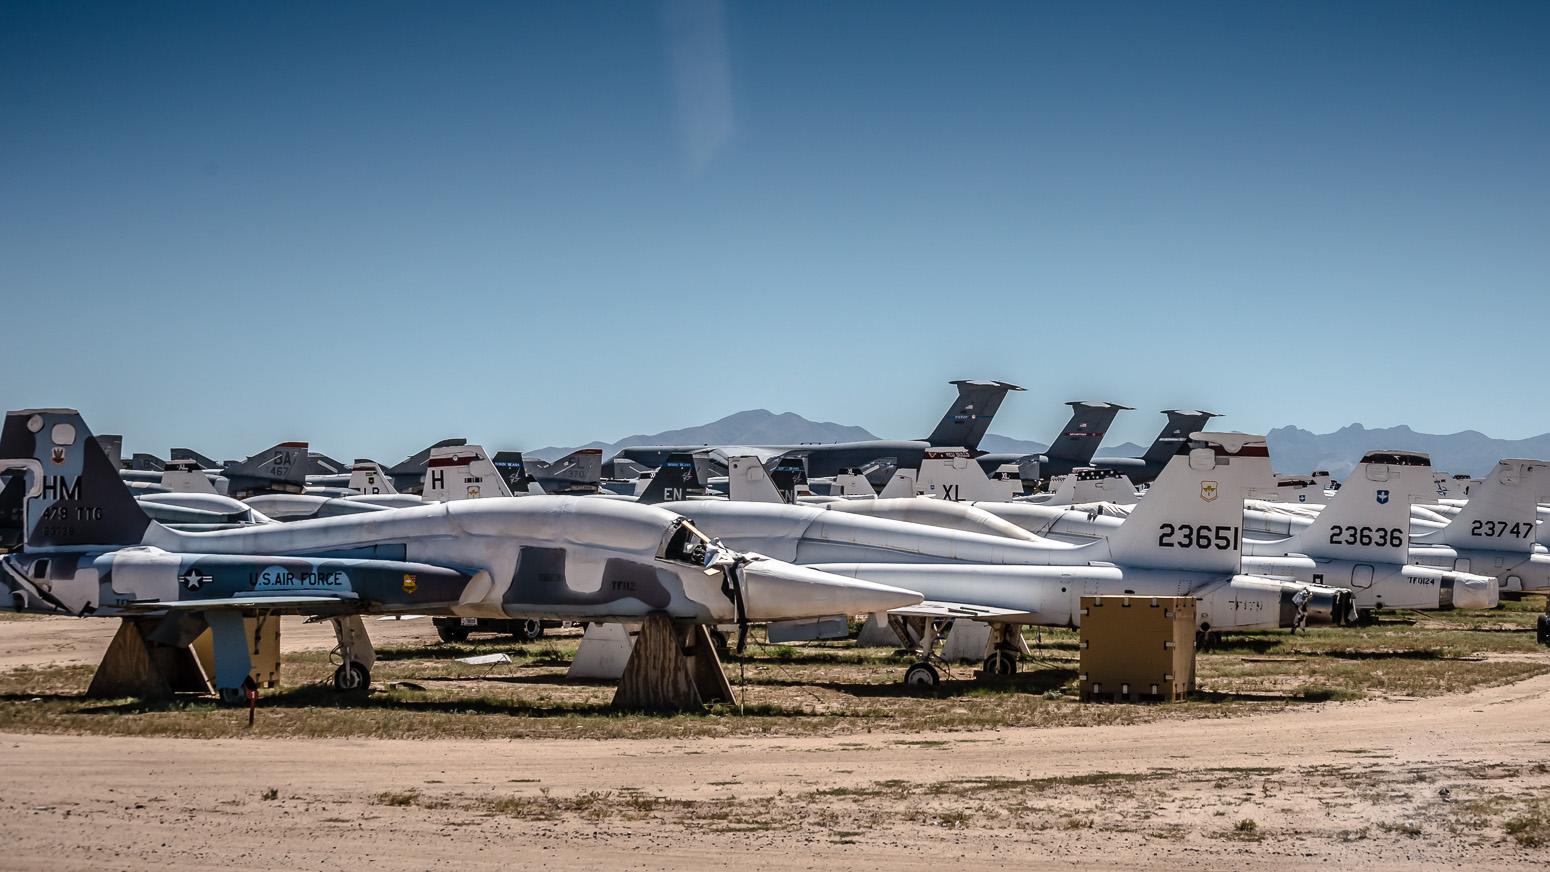 Northrop F-5, The Boneyard, Davis-Monthan Air Force Base, Tucson, USA